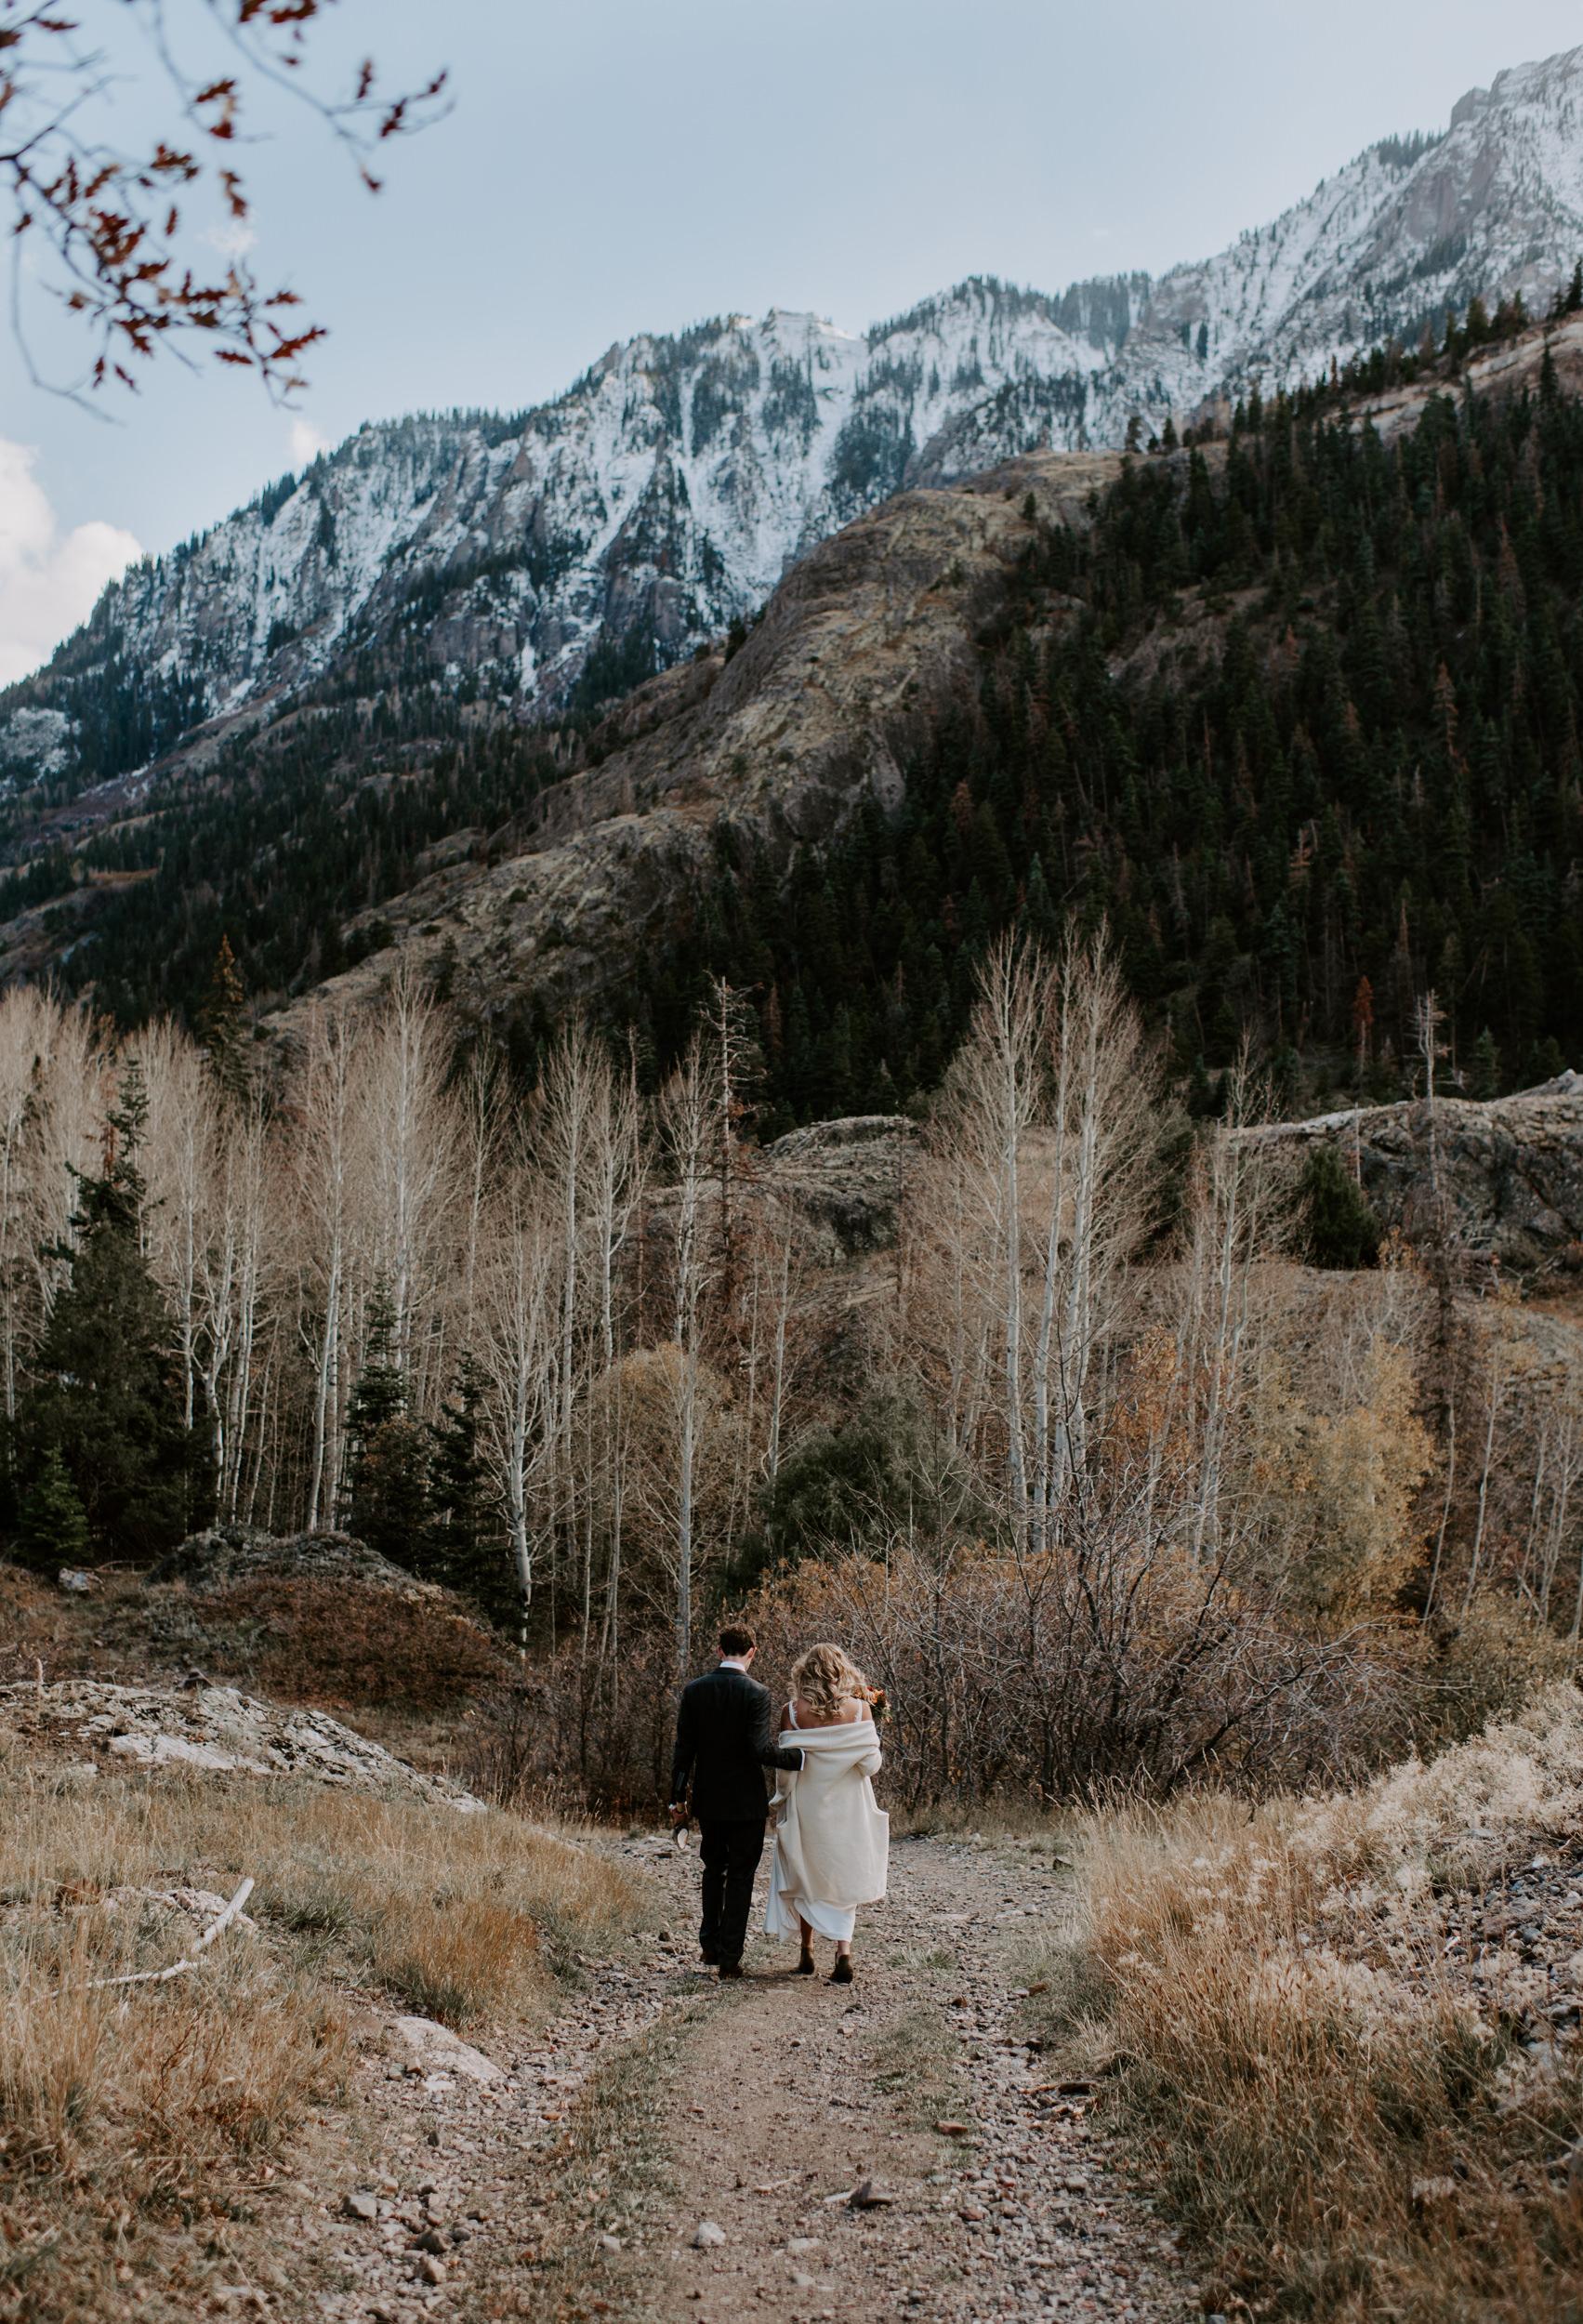 Telluride mountain elopement in the San Juan mountains. Million Dollar Highway elopement photos. Colorado wedding photographer.